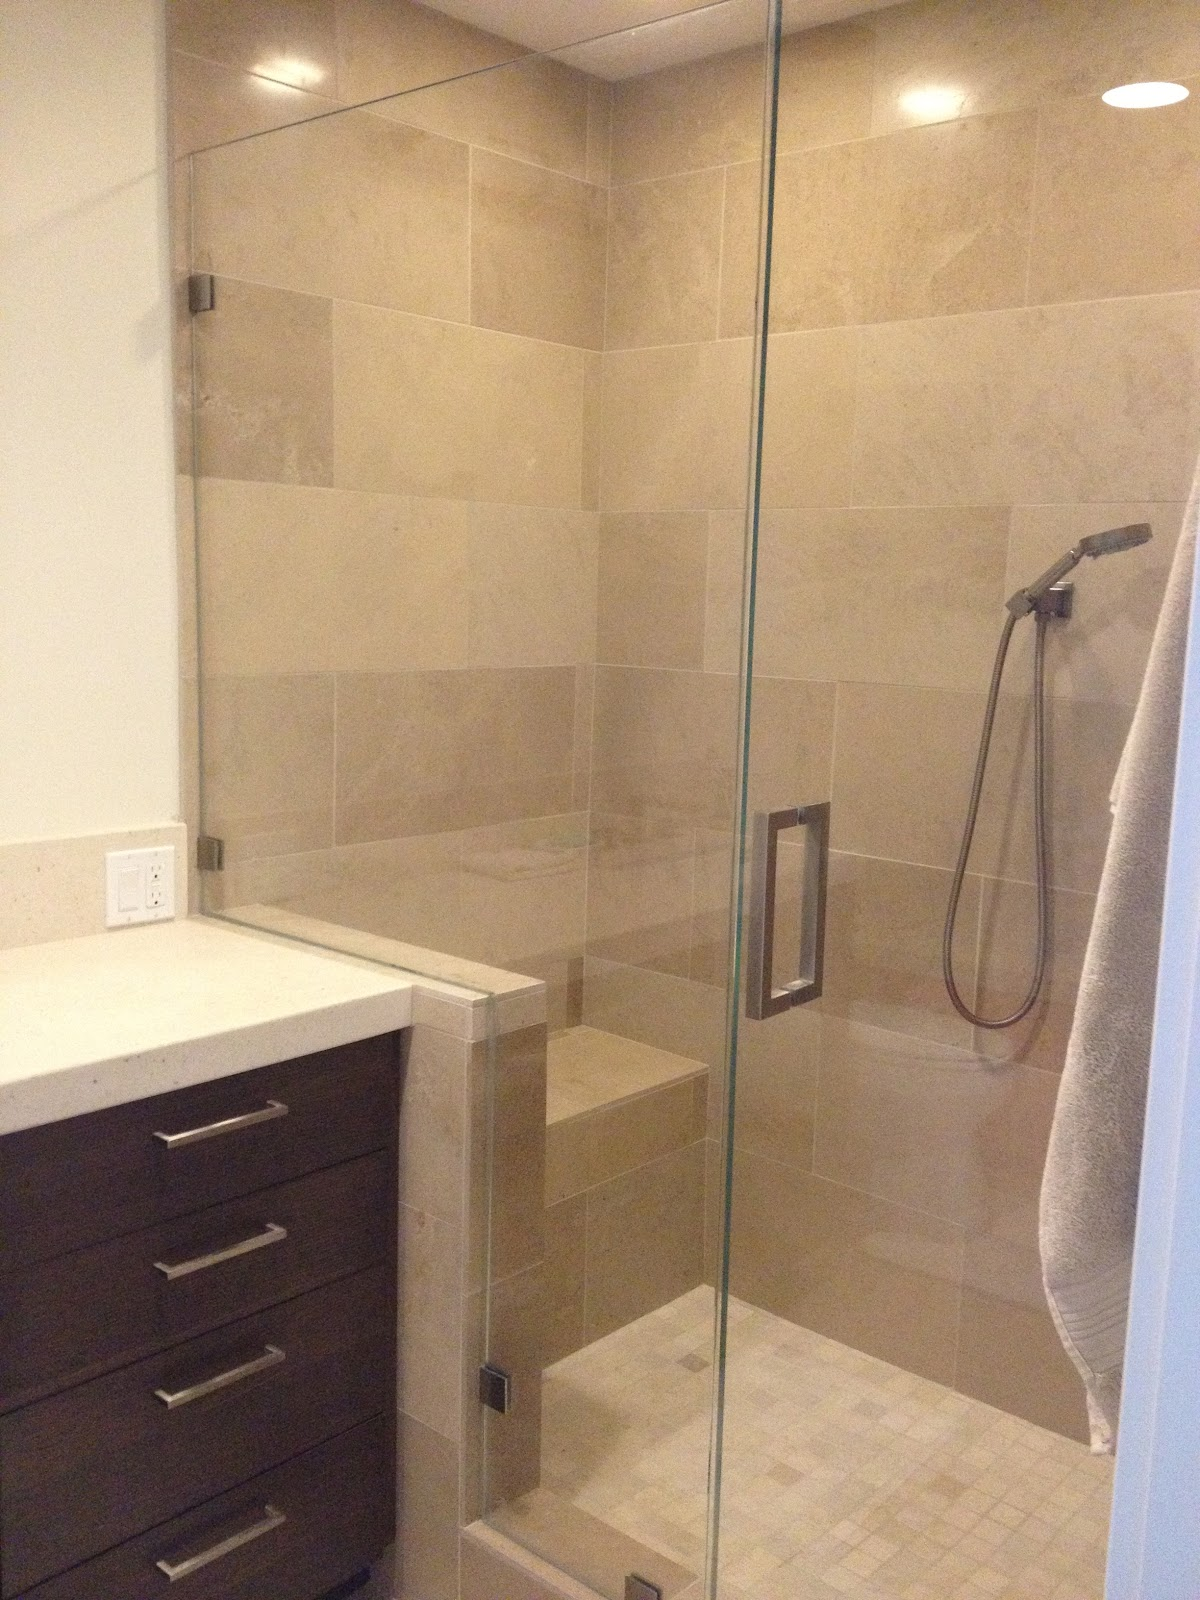 Suzy kloner design westwood condo project - Bathroom wall tile design patterns ...